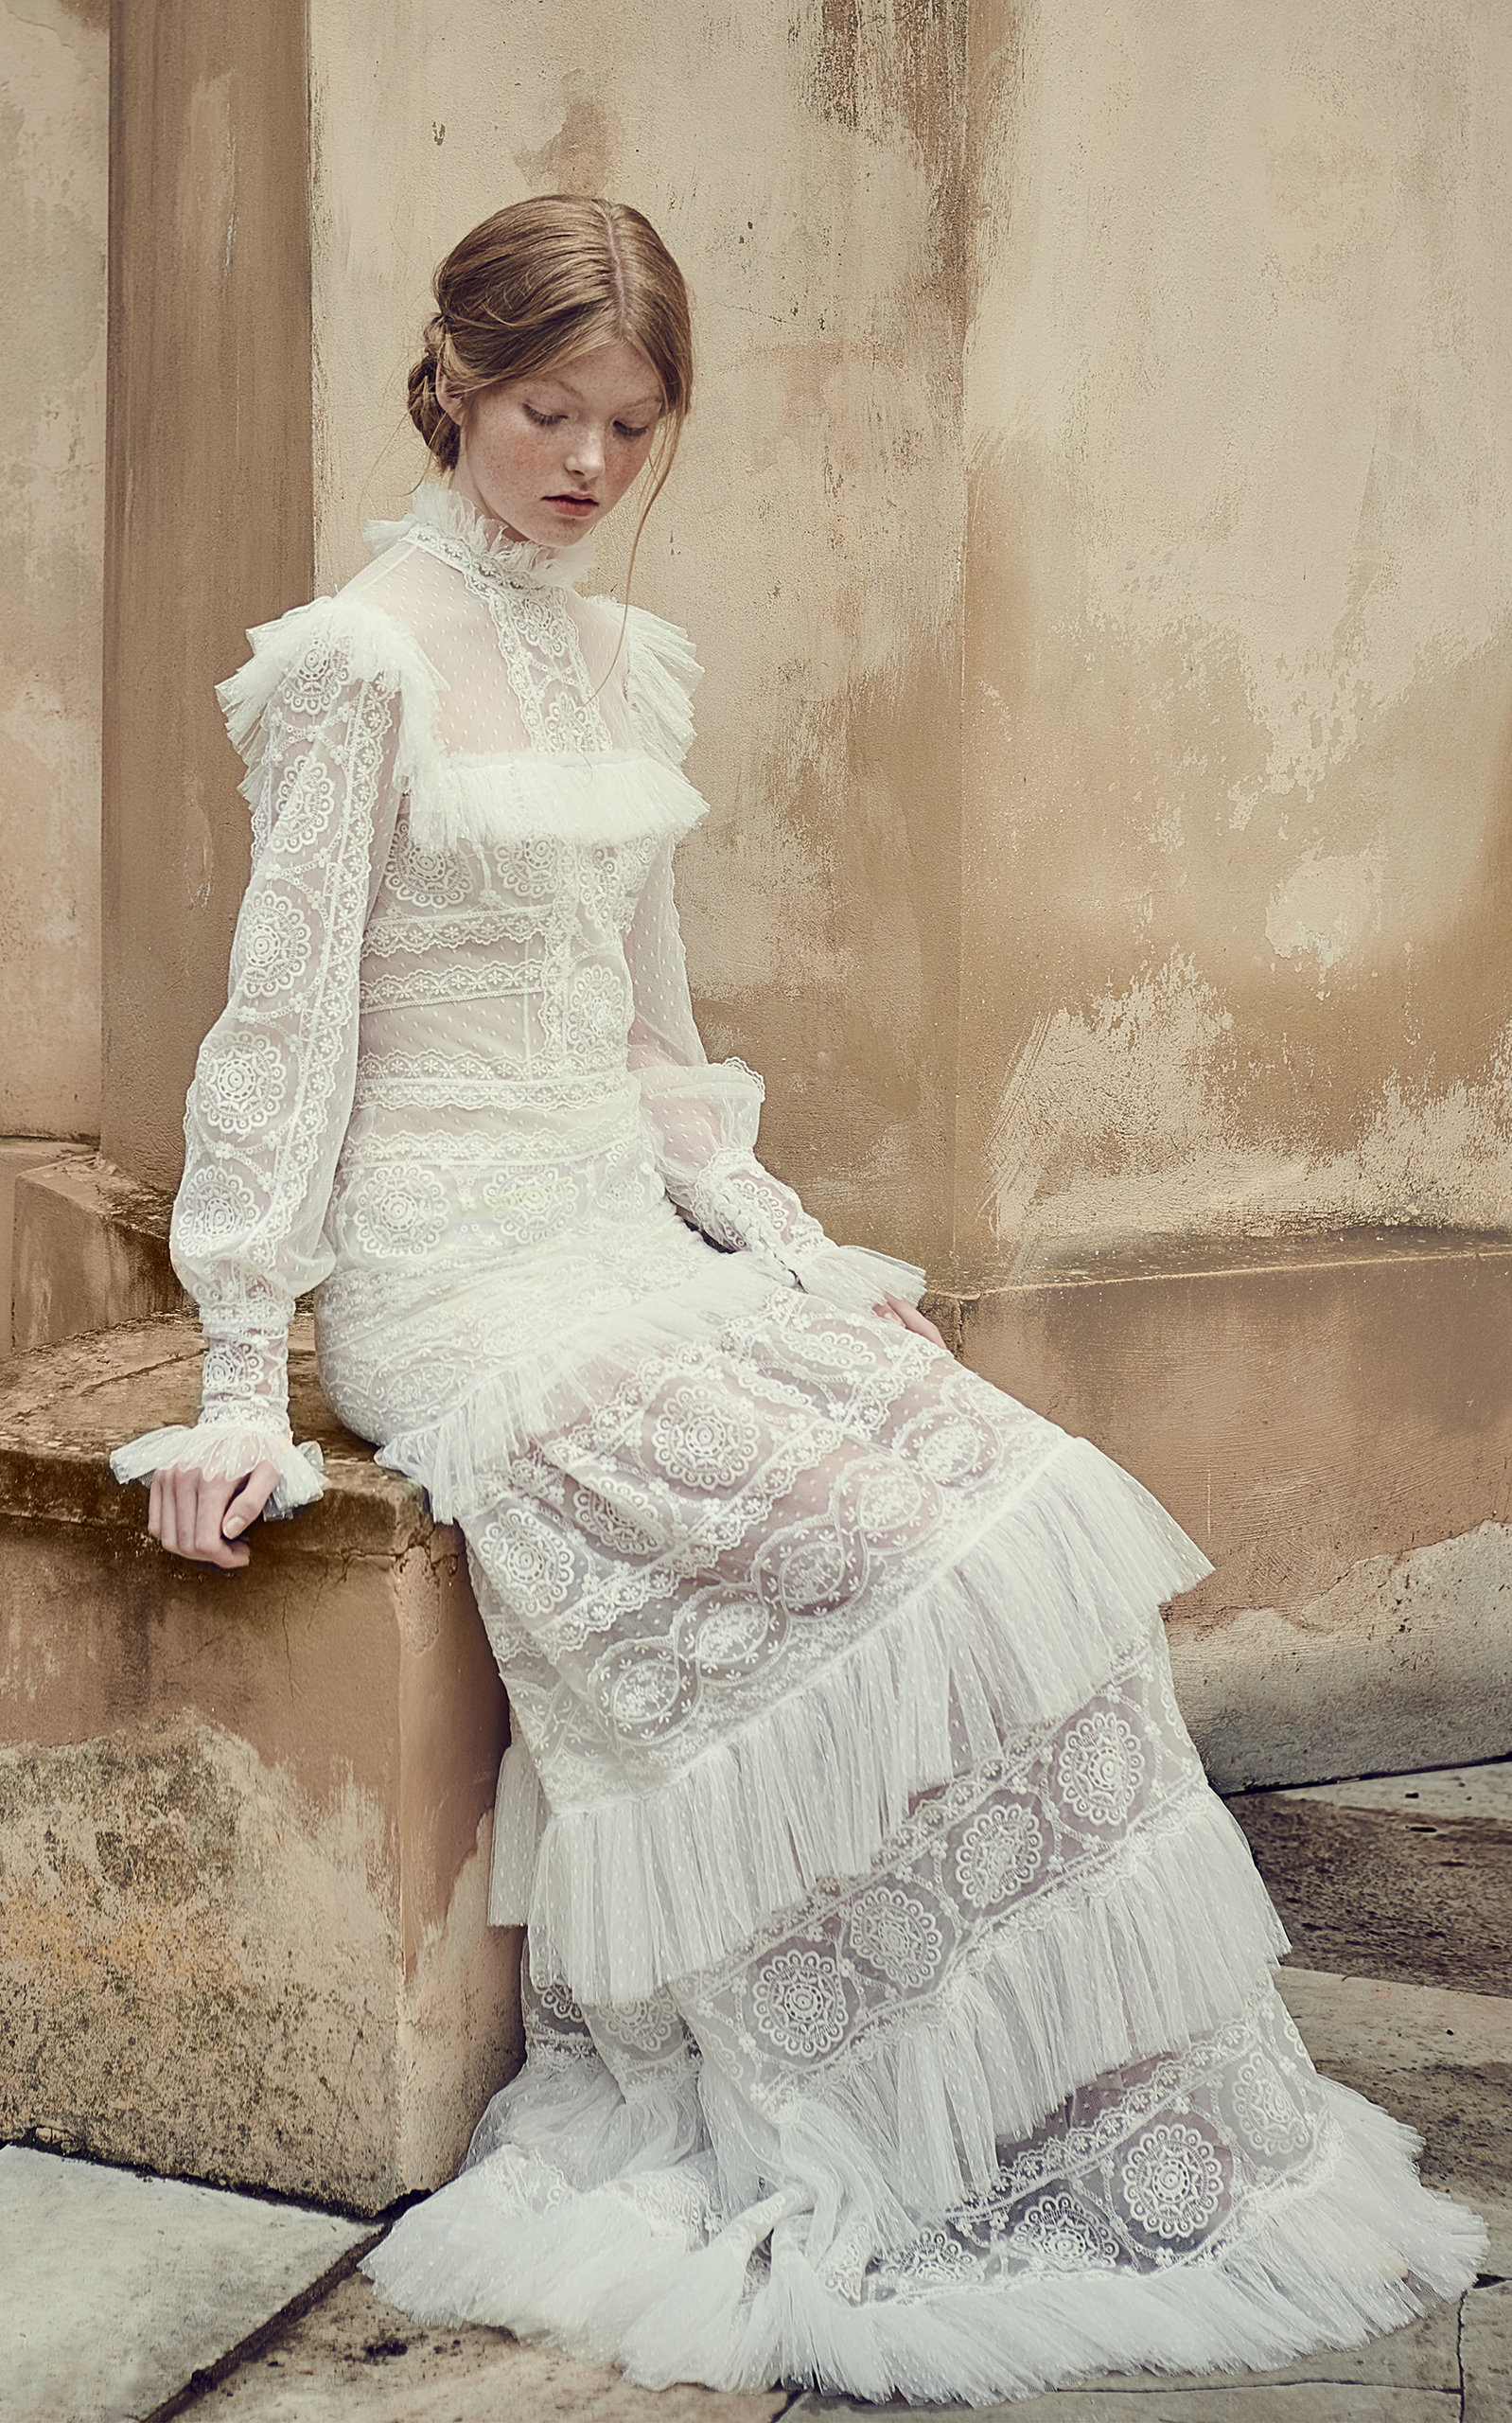 Buy Costarellos Bridal Mock-neck Ruffled Mesh Dress online, shop Costarellos Bridal at the best price